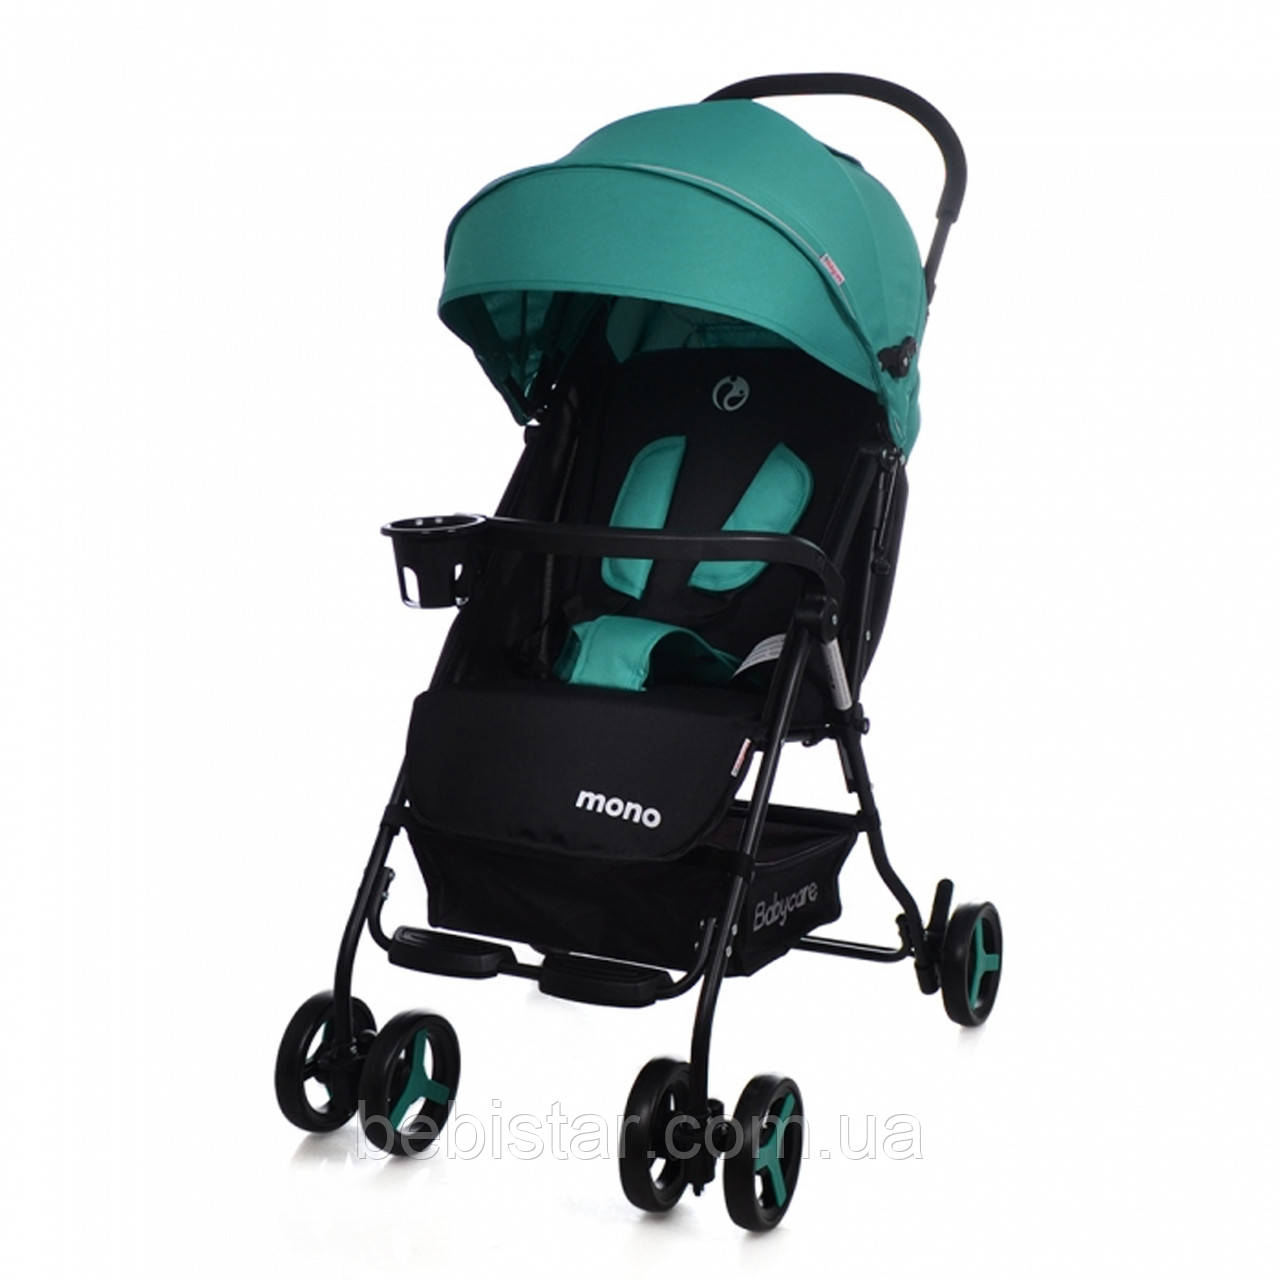 Детская коляска BABYCARE Mono BC-1417 Green для деток 6 до 36 месяцев